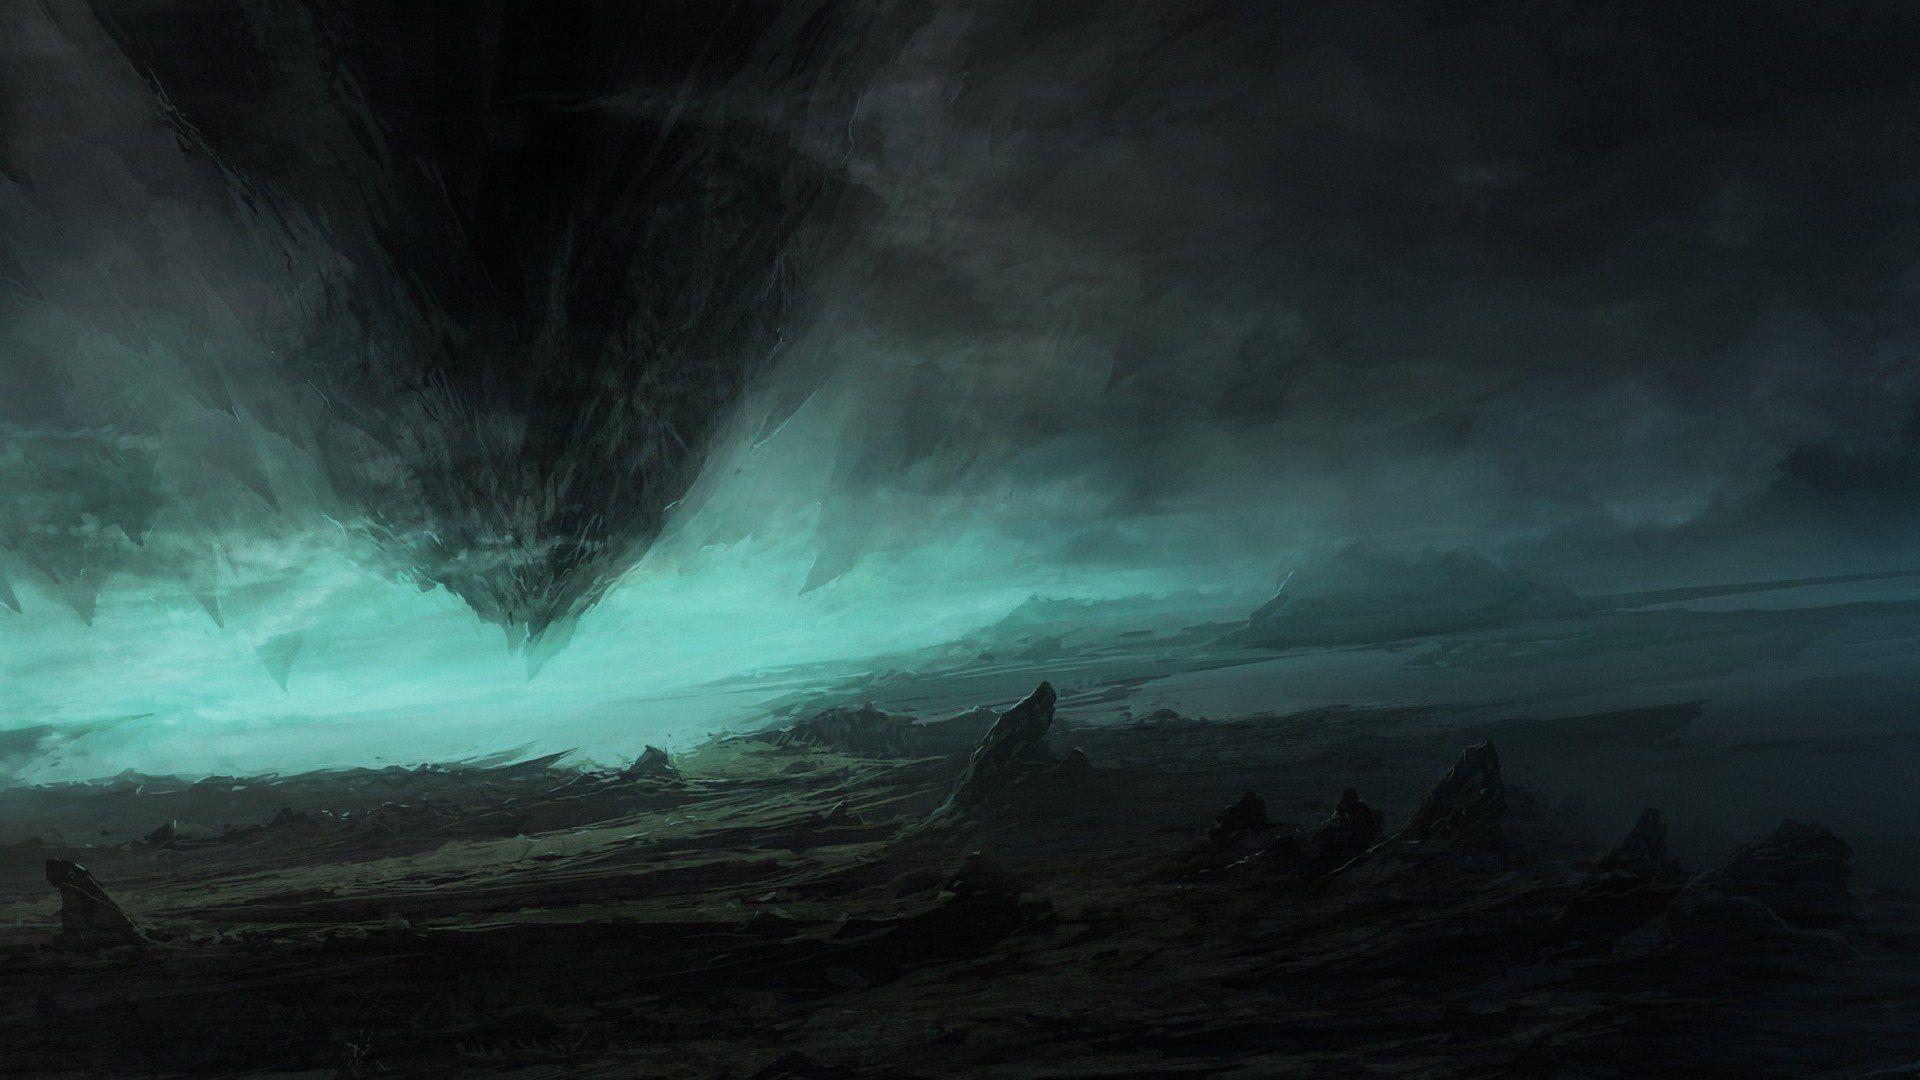 Anime Dark Landscape Wallpapers For Android Monodomo Dark Landscape Digital Artwork Fantasy Digital Art Fantasy